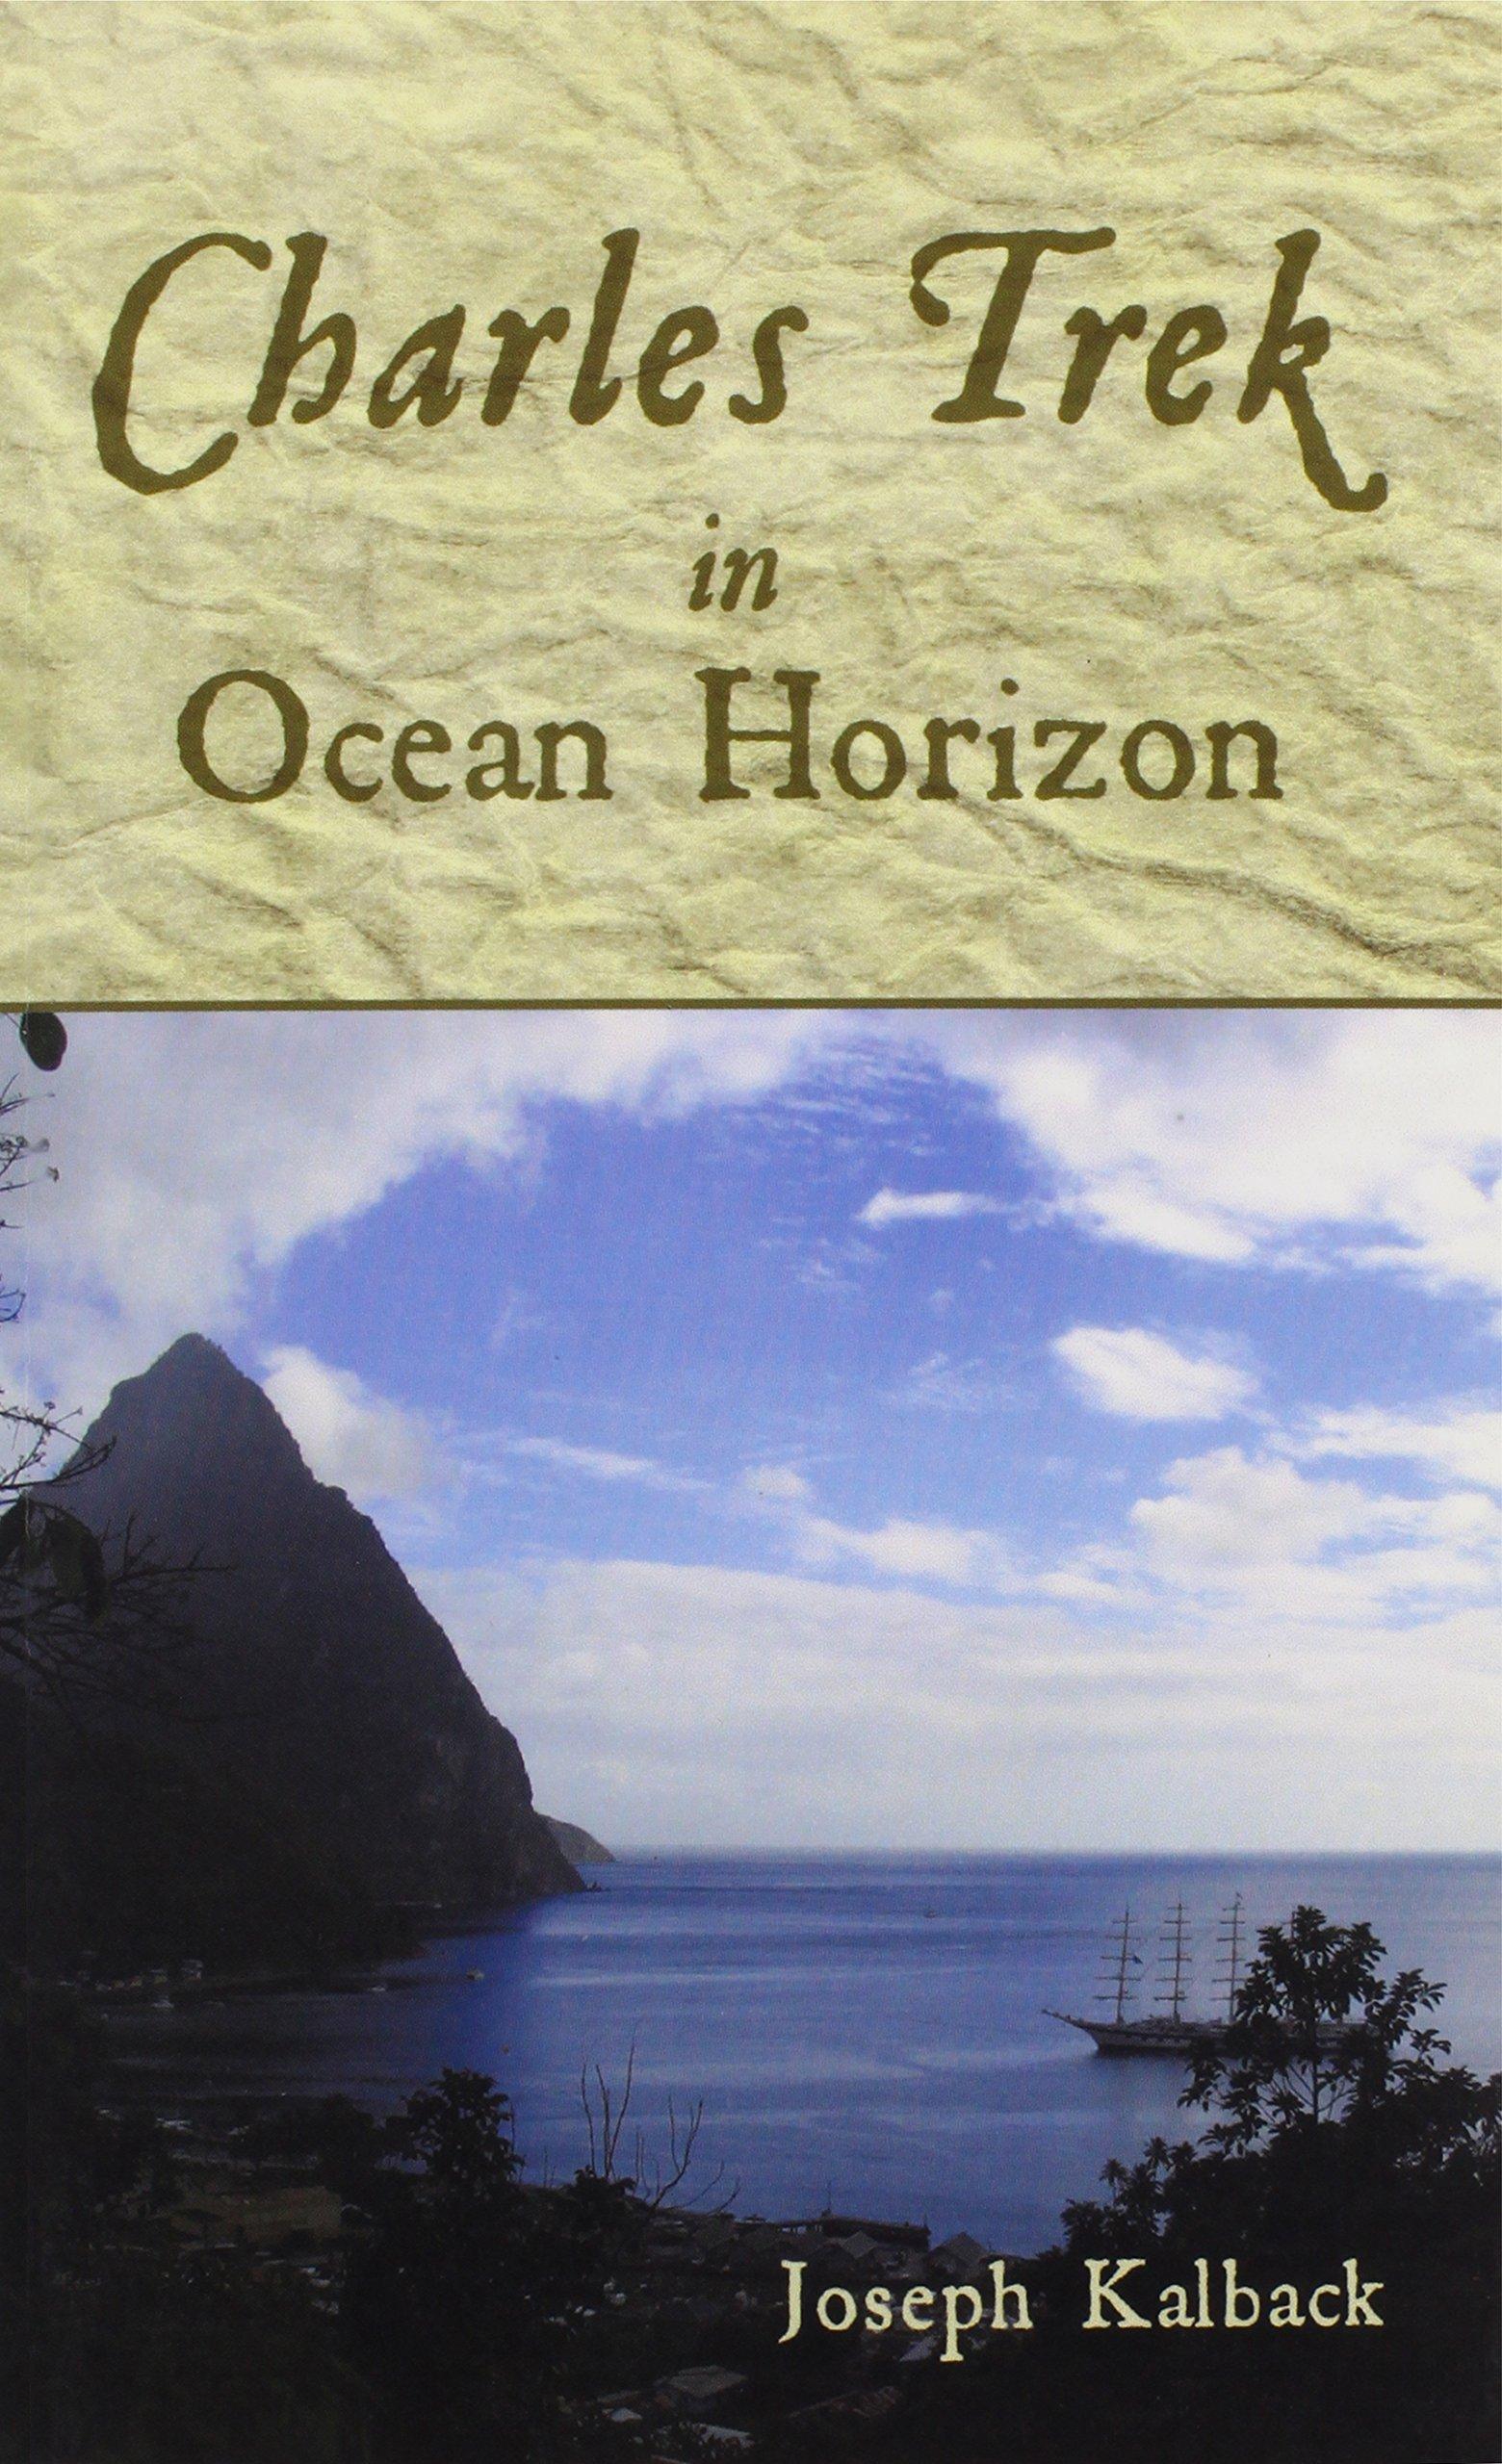 Charles Trek in Ocean Horizon PDF